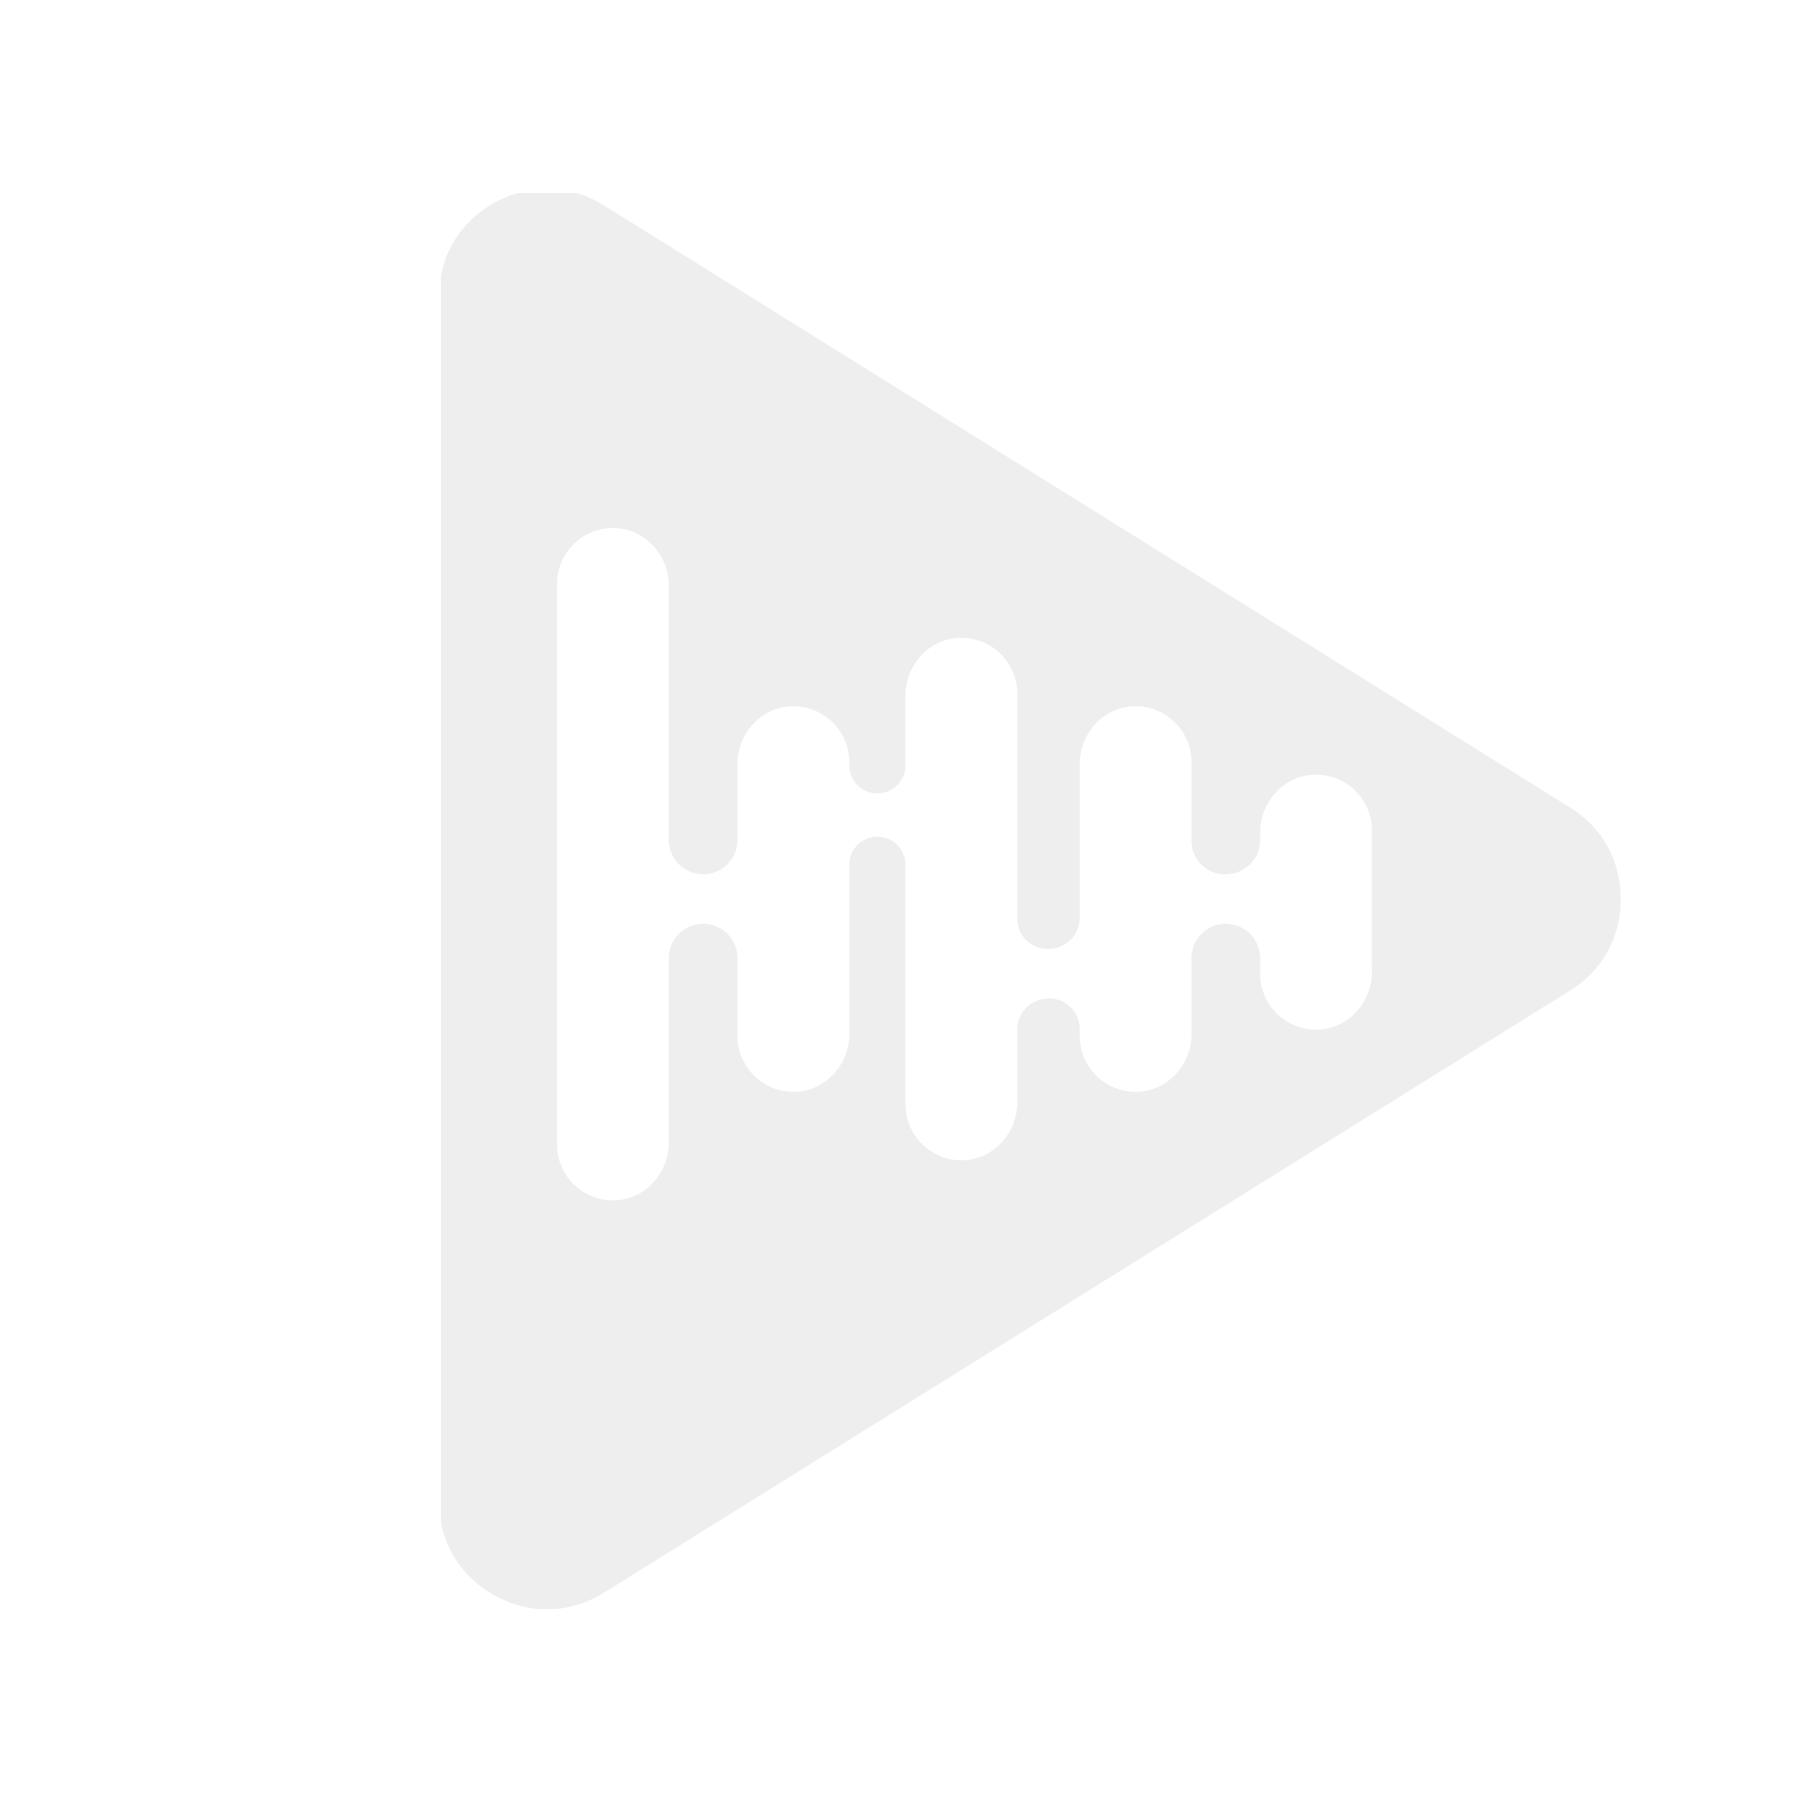 Scosche SoundKase SKF-5P - Ekstra lommer for SCK144, SCK208, 5 stk